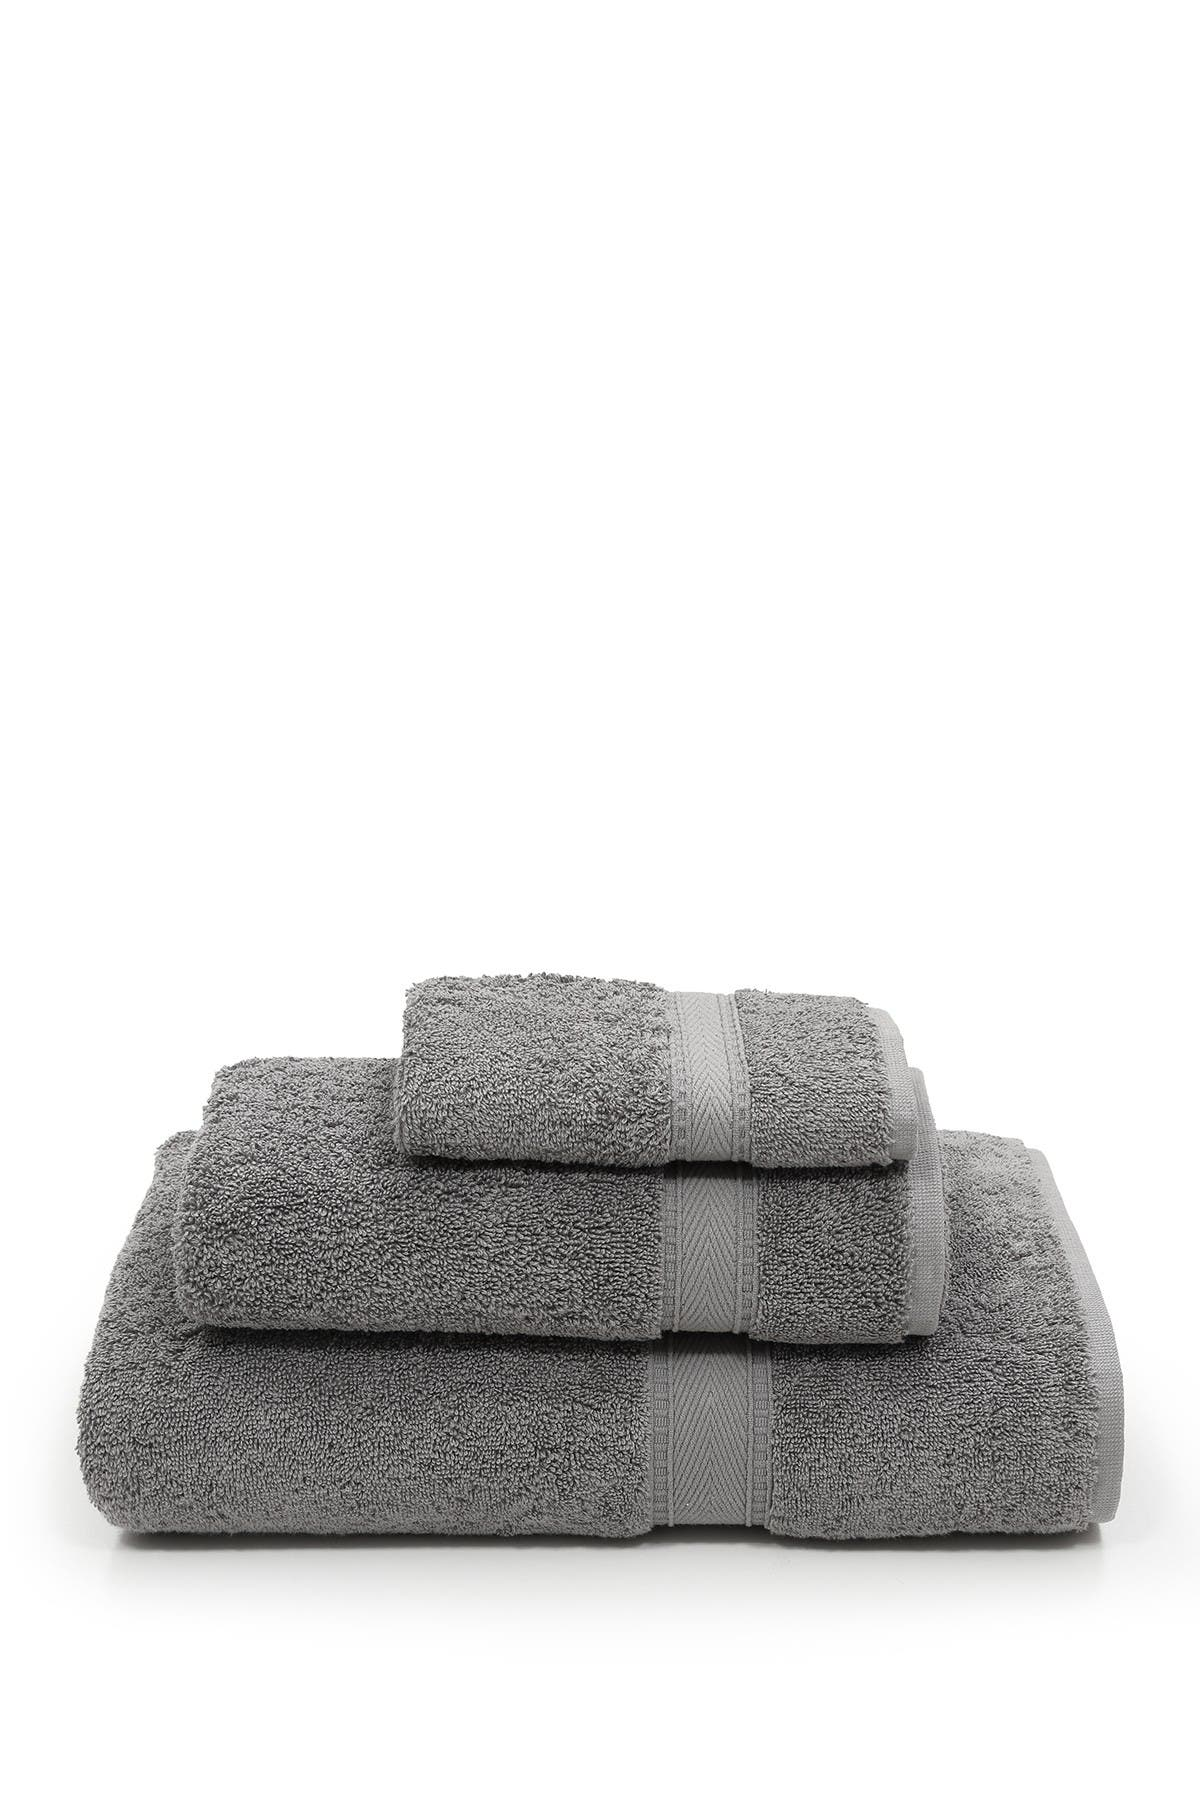 Image of LINUM HOME Sinemis Terry 3-Piece Towel Set - Dark Grey